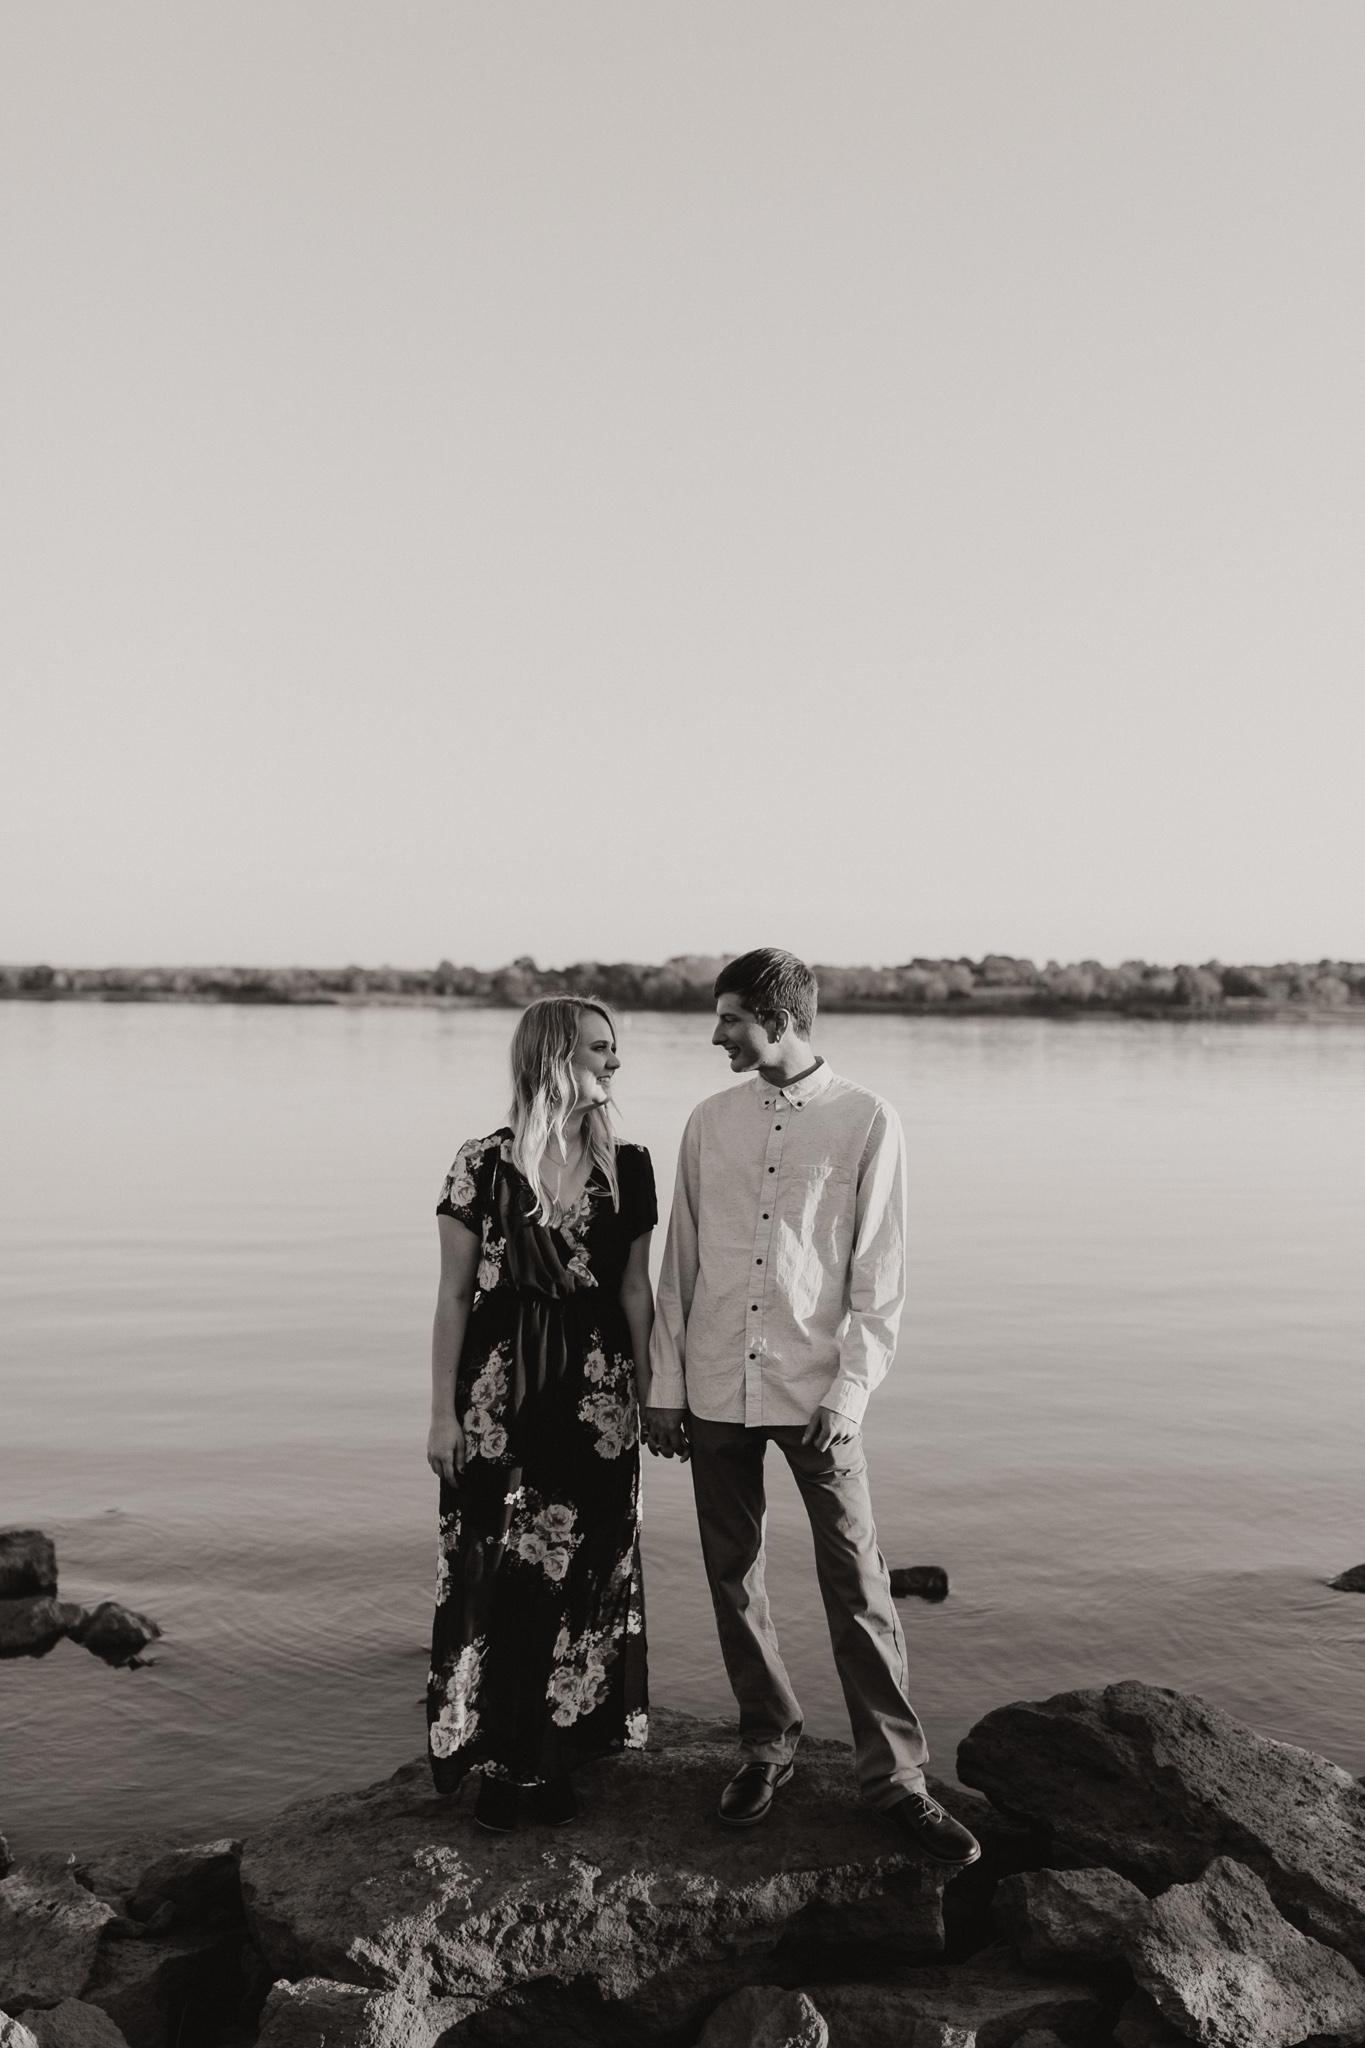 Kyle + Brittany | Fall Lake Engagement Photos | Oklahoma Lifestyle Photographer-33.jpg